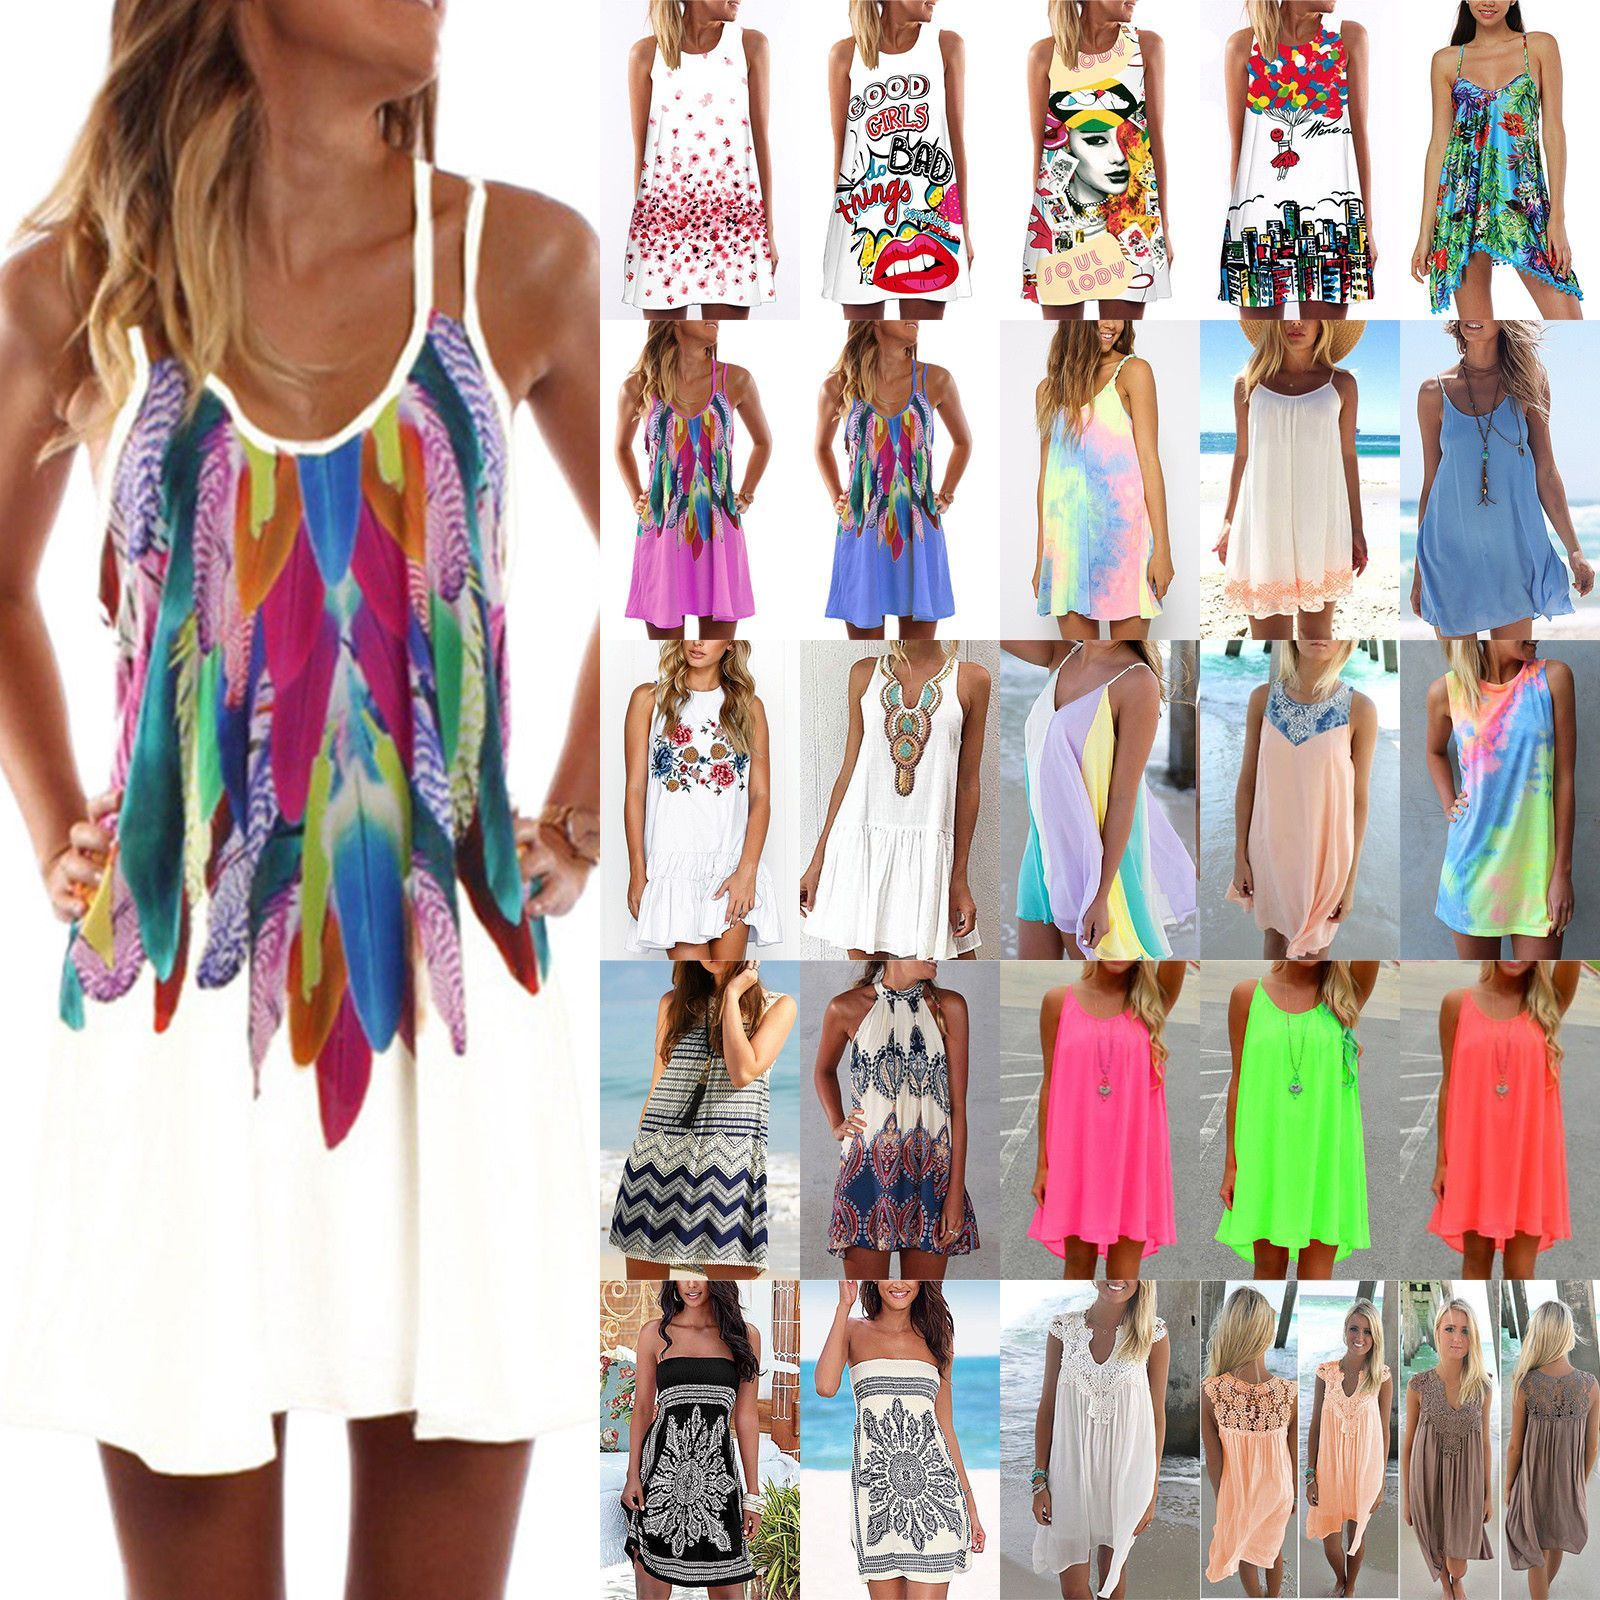 Damen Träger Tunika Kleid Boho Strandkleid Sommerkleid Minikleid Bikini Cover Up